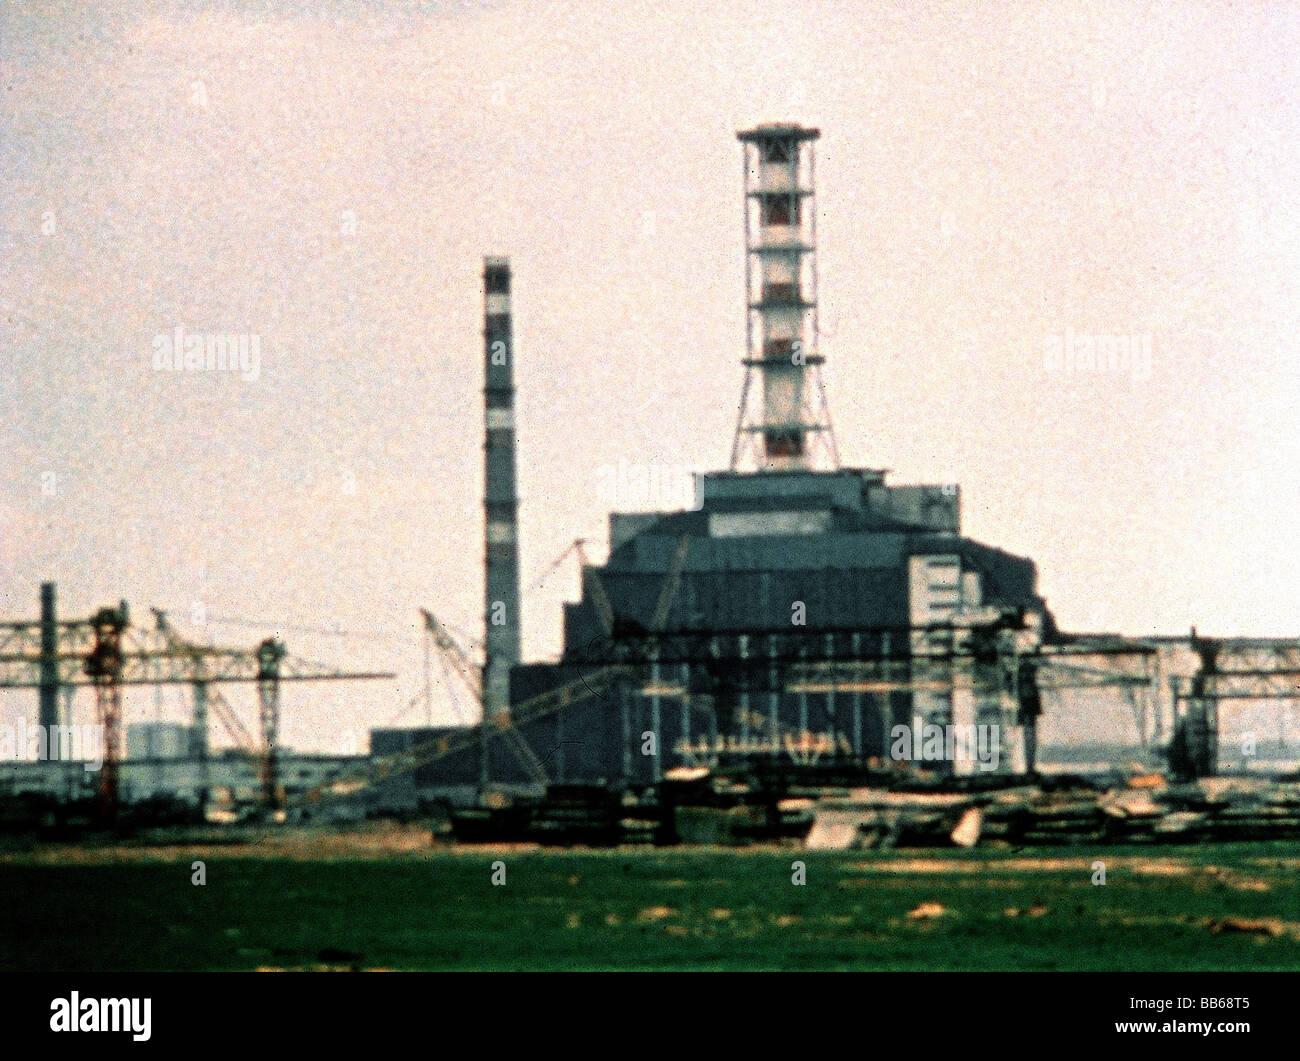 geography / travel, Ukraina, Chernobyl accident, April 1986, reactor, scene, documentary, 'Porog', 1988, - Stock Image